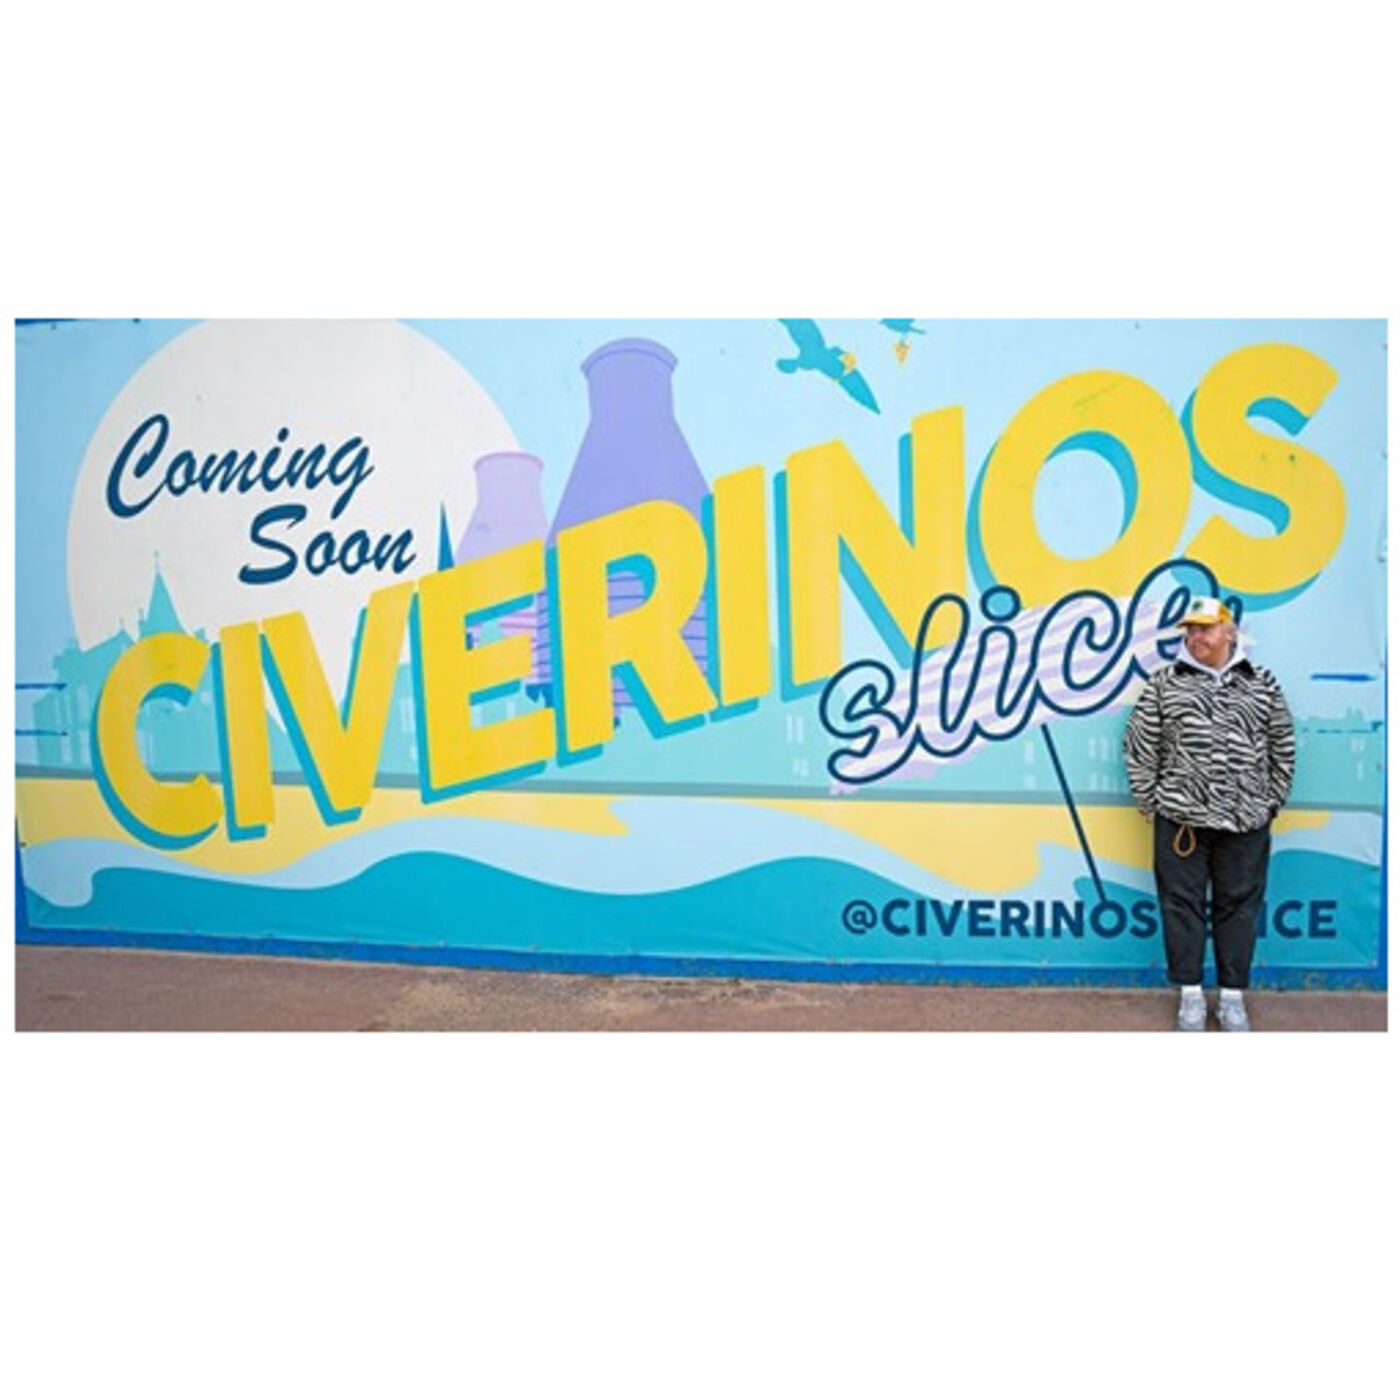 203 Civerinos Porty Slice